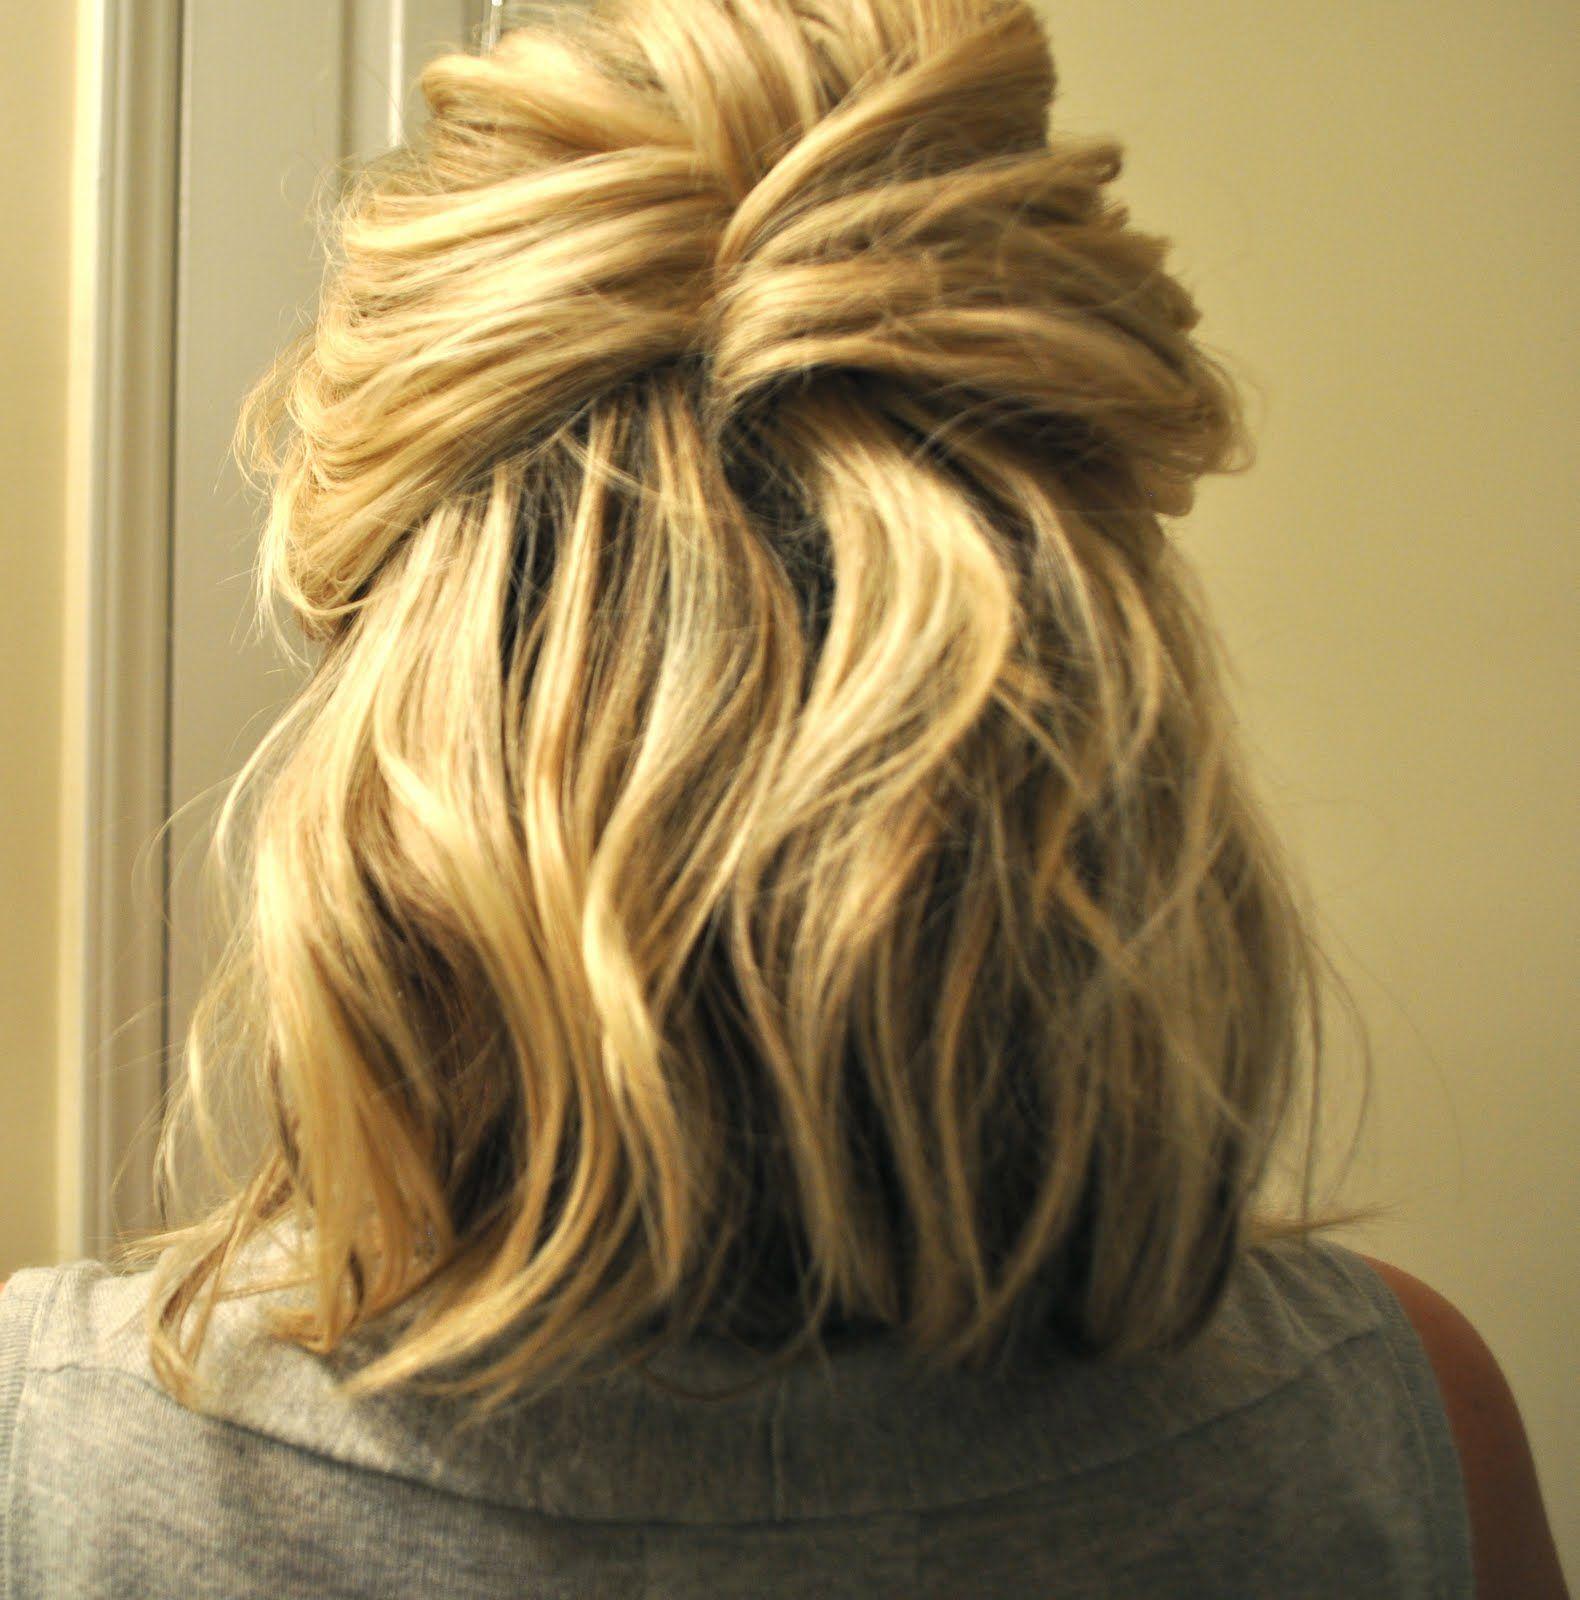 I Love This Half French Twist For Short Hair Hair Styles Long Hair Styles Hair Lengths